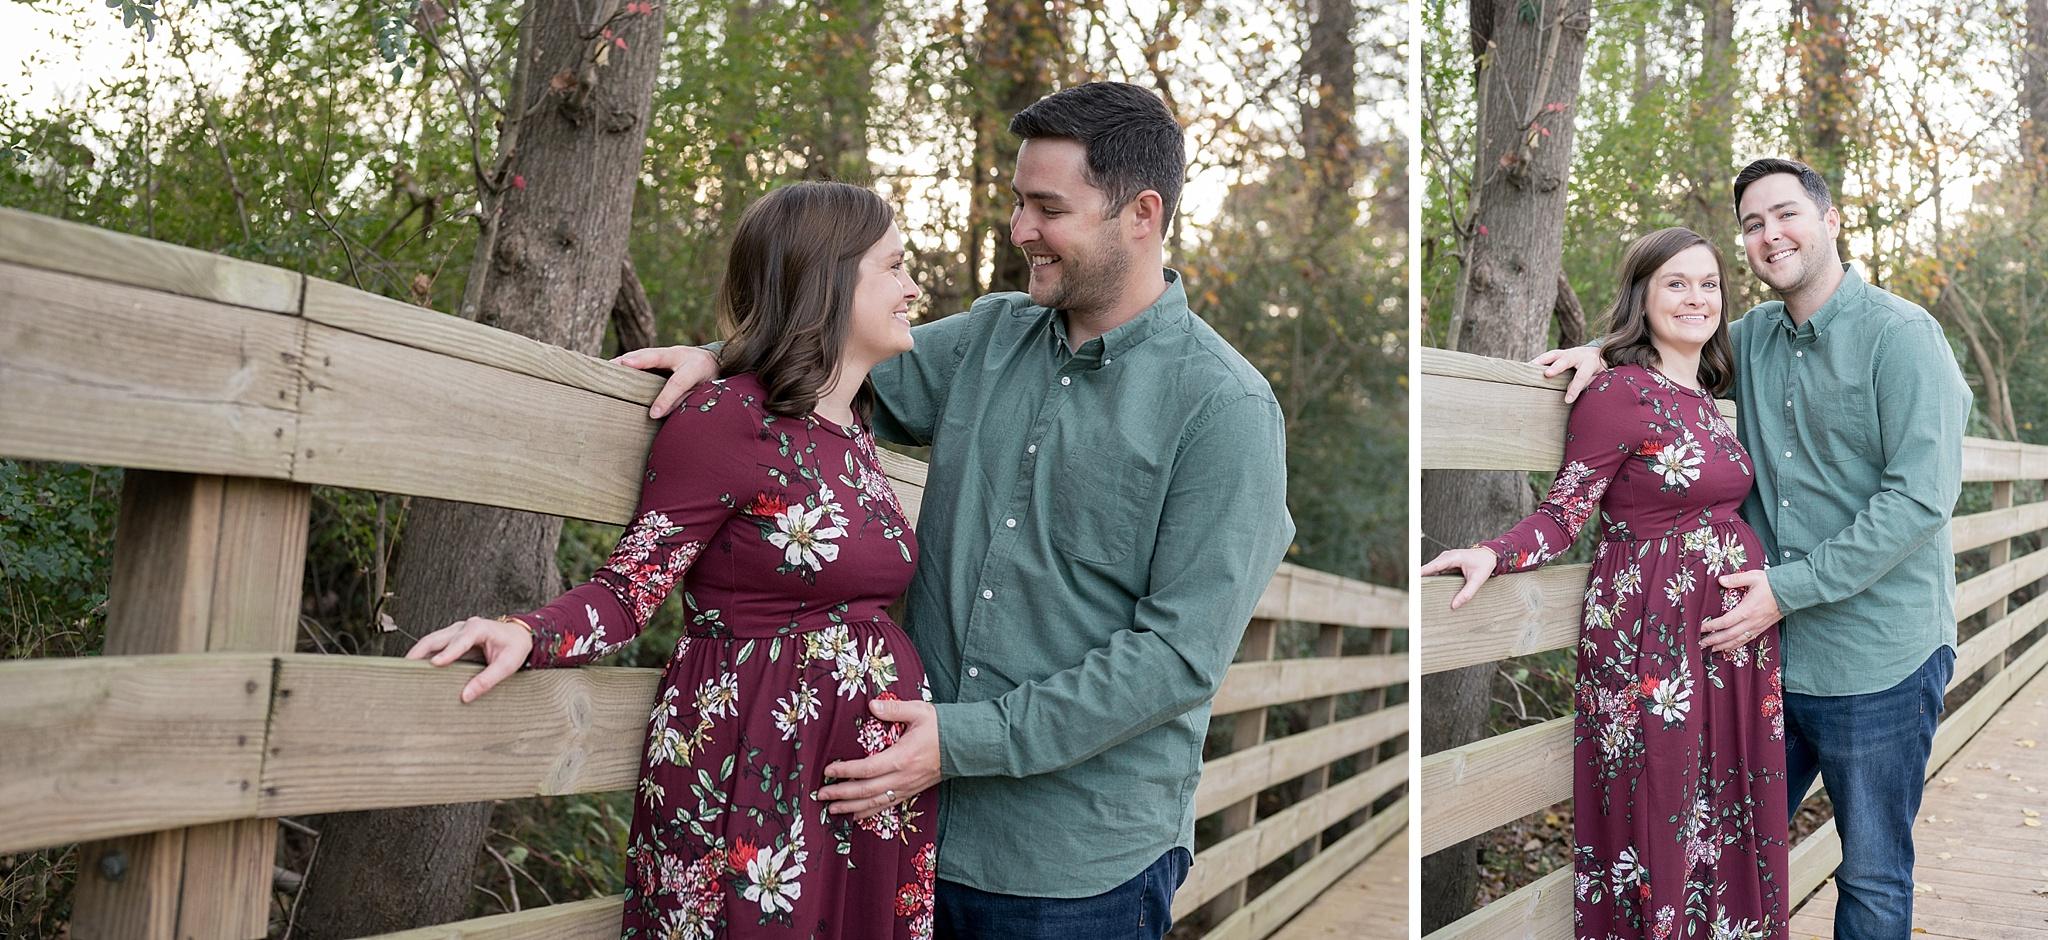 Greenville-NC-Maternity-Photographer-036.jpg